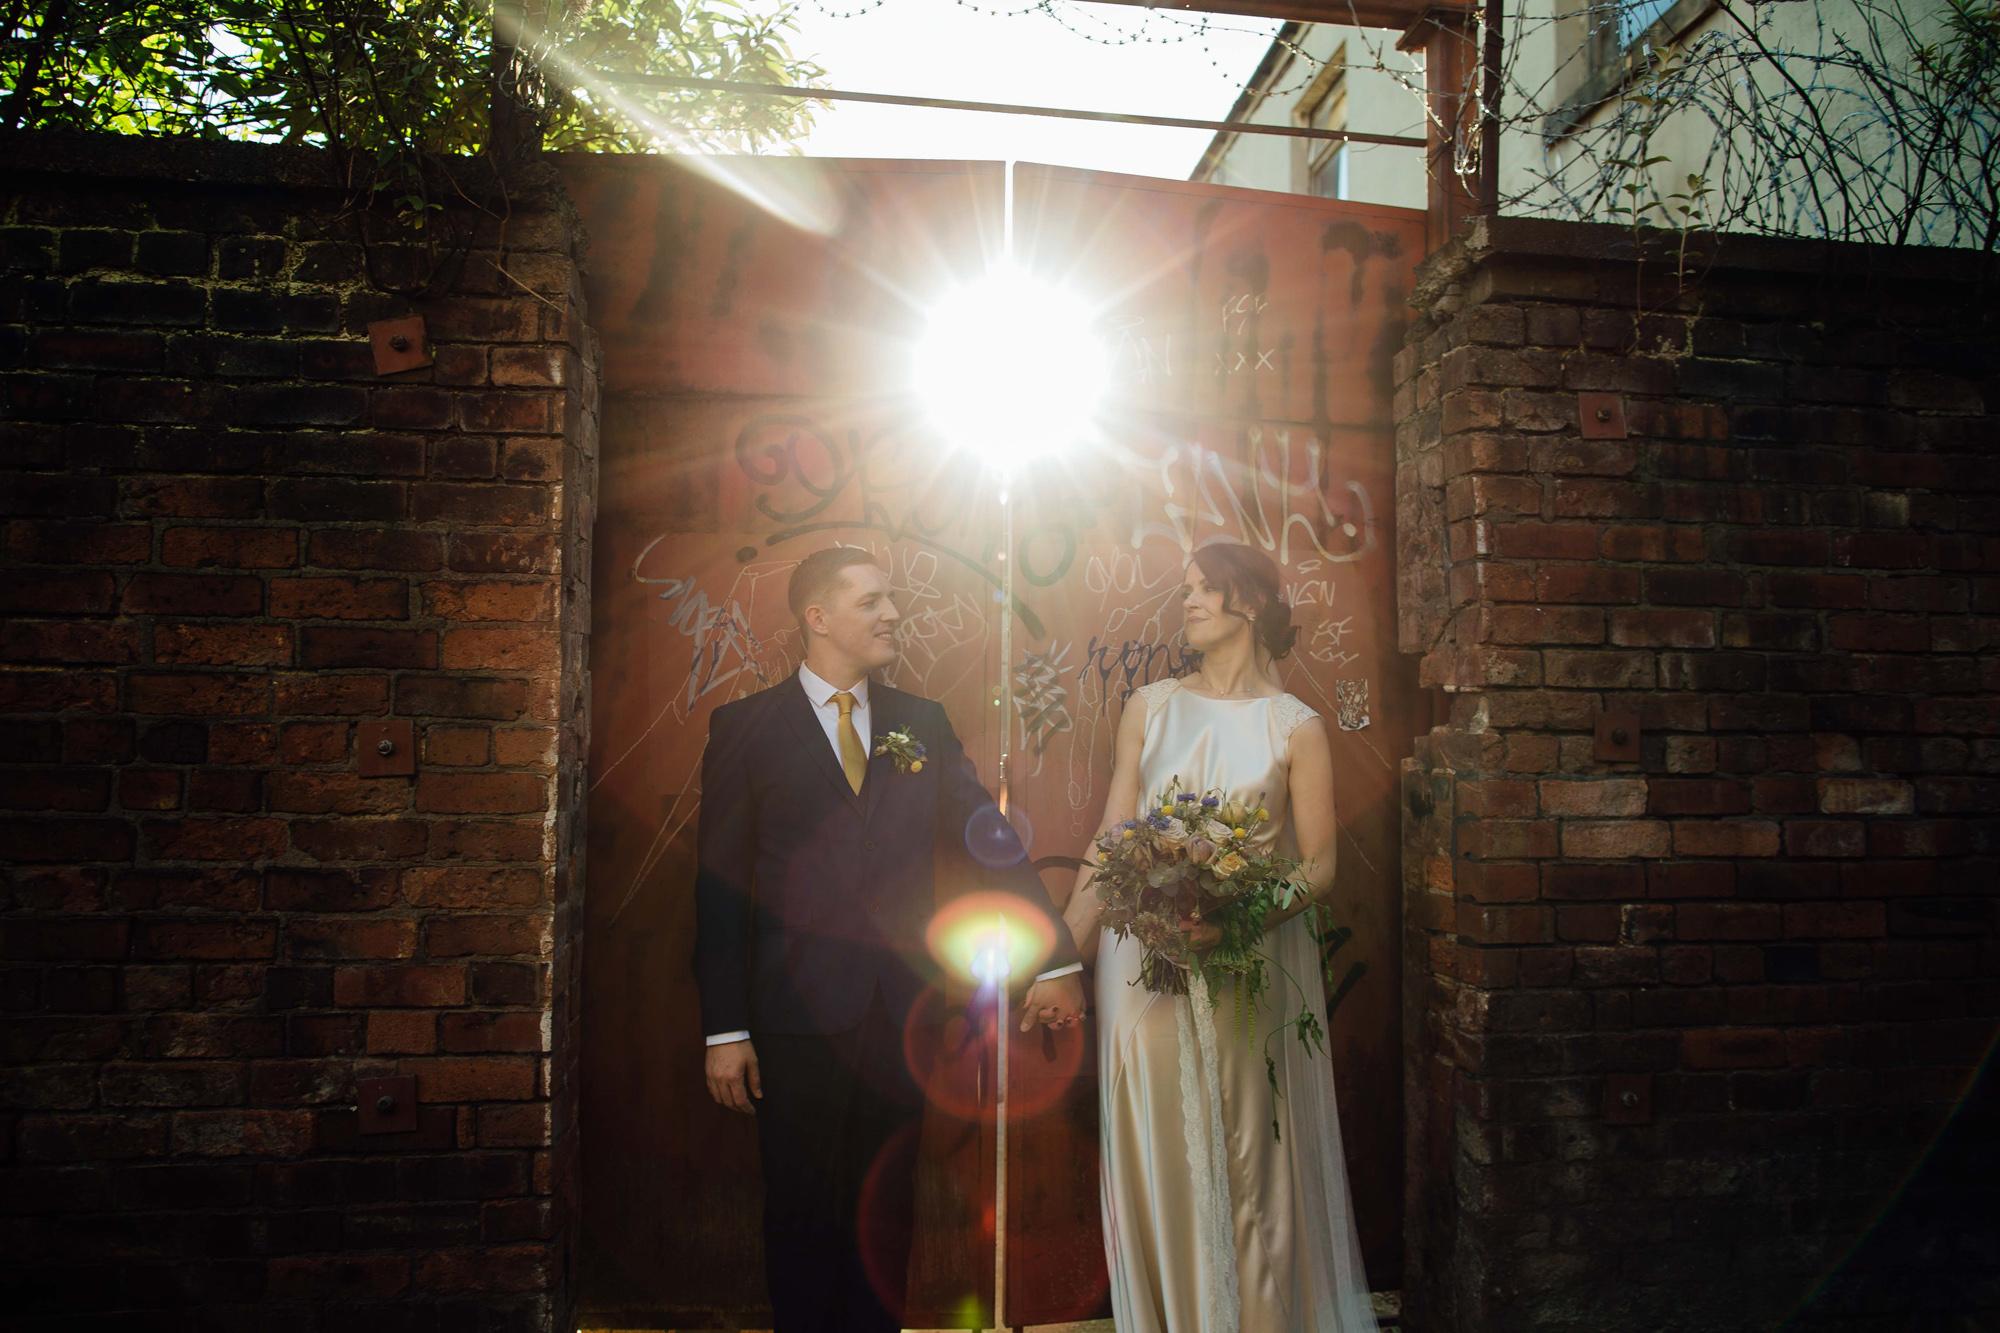 Sarah-Honeysuckle-Bias-Cut-Silk-Vintage-Inspired-Wedding-Gown-Sheffield-Wedding-Kate-Beaumont-57.jpg